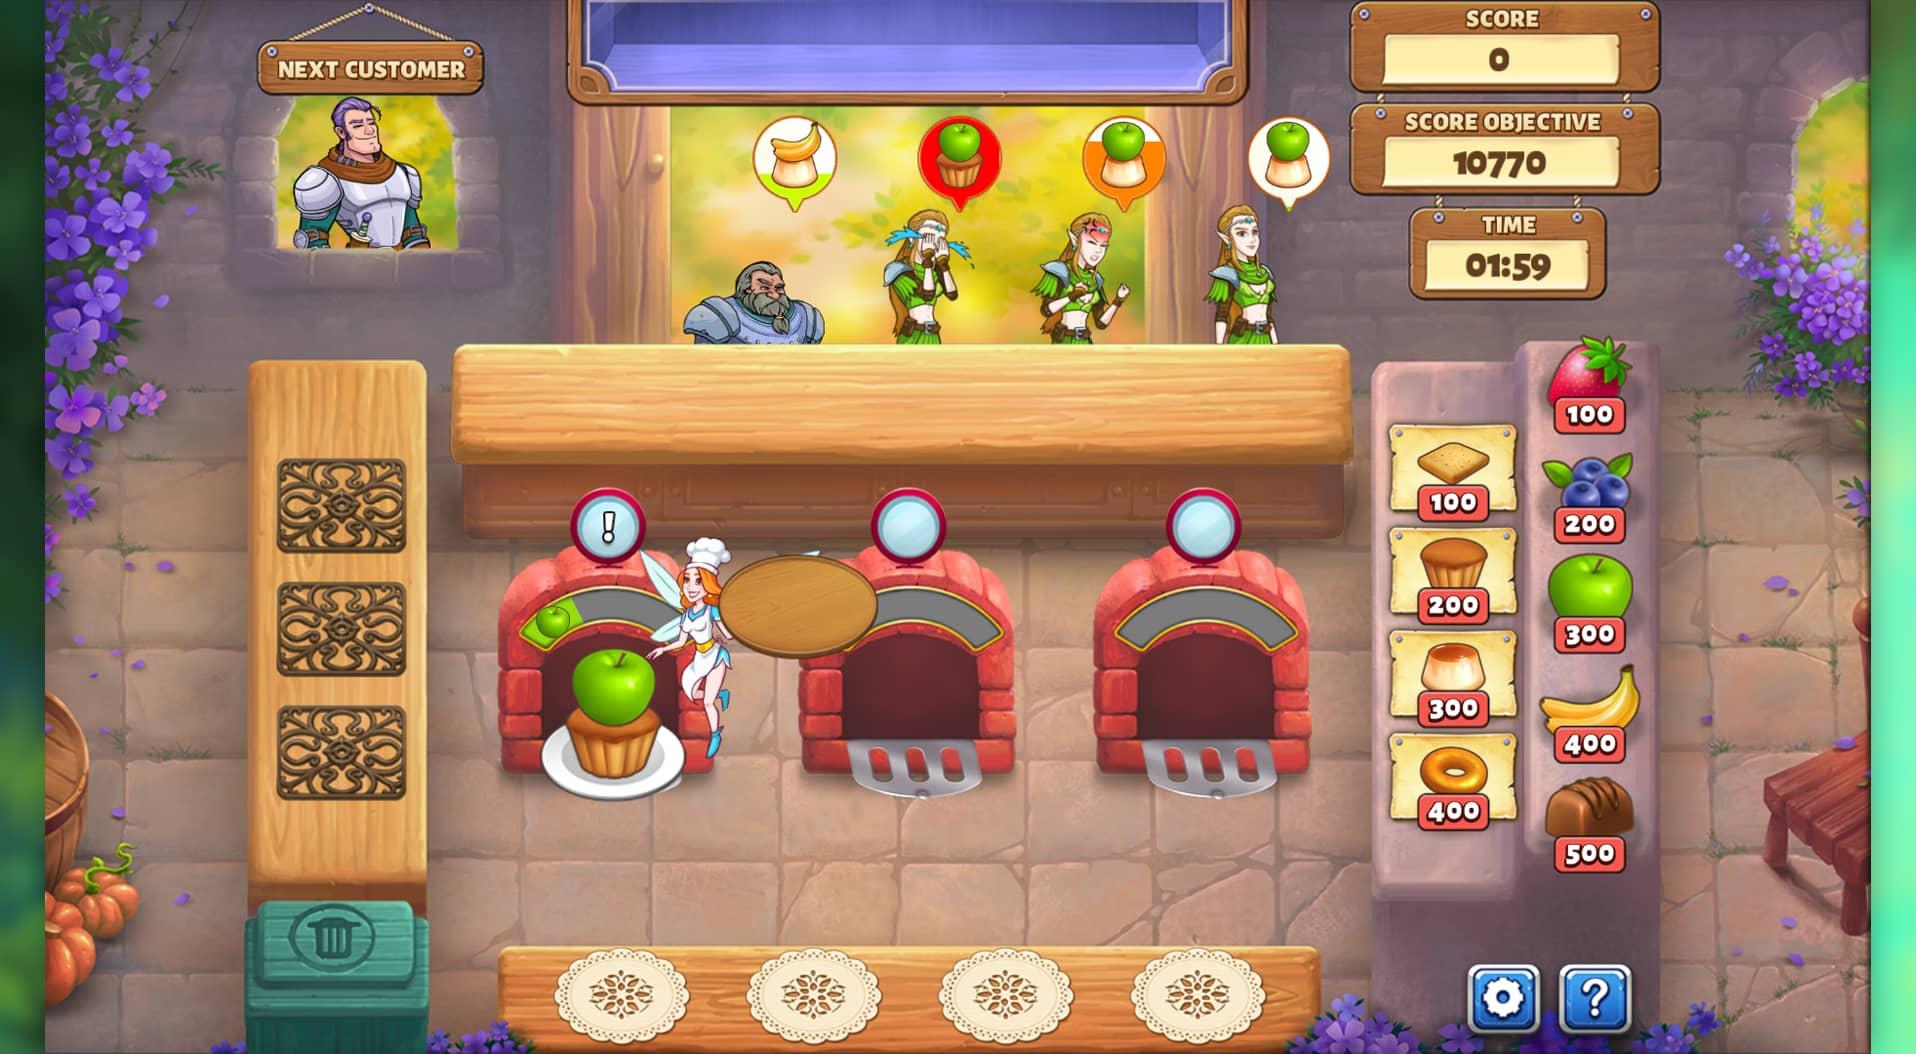 Sun palace casino no deposit bonus codes 2015